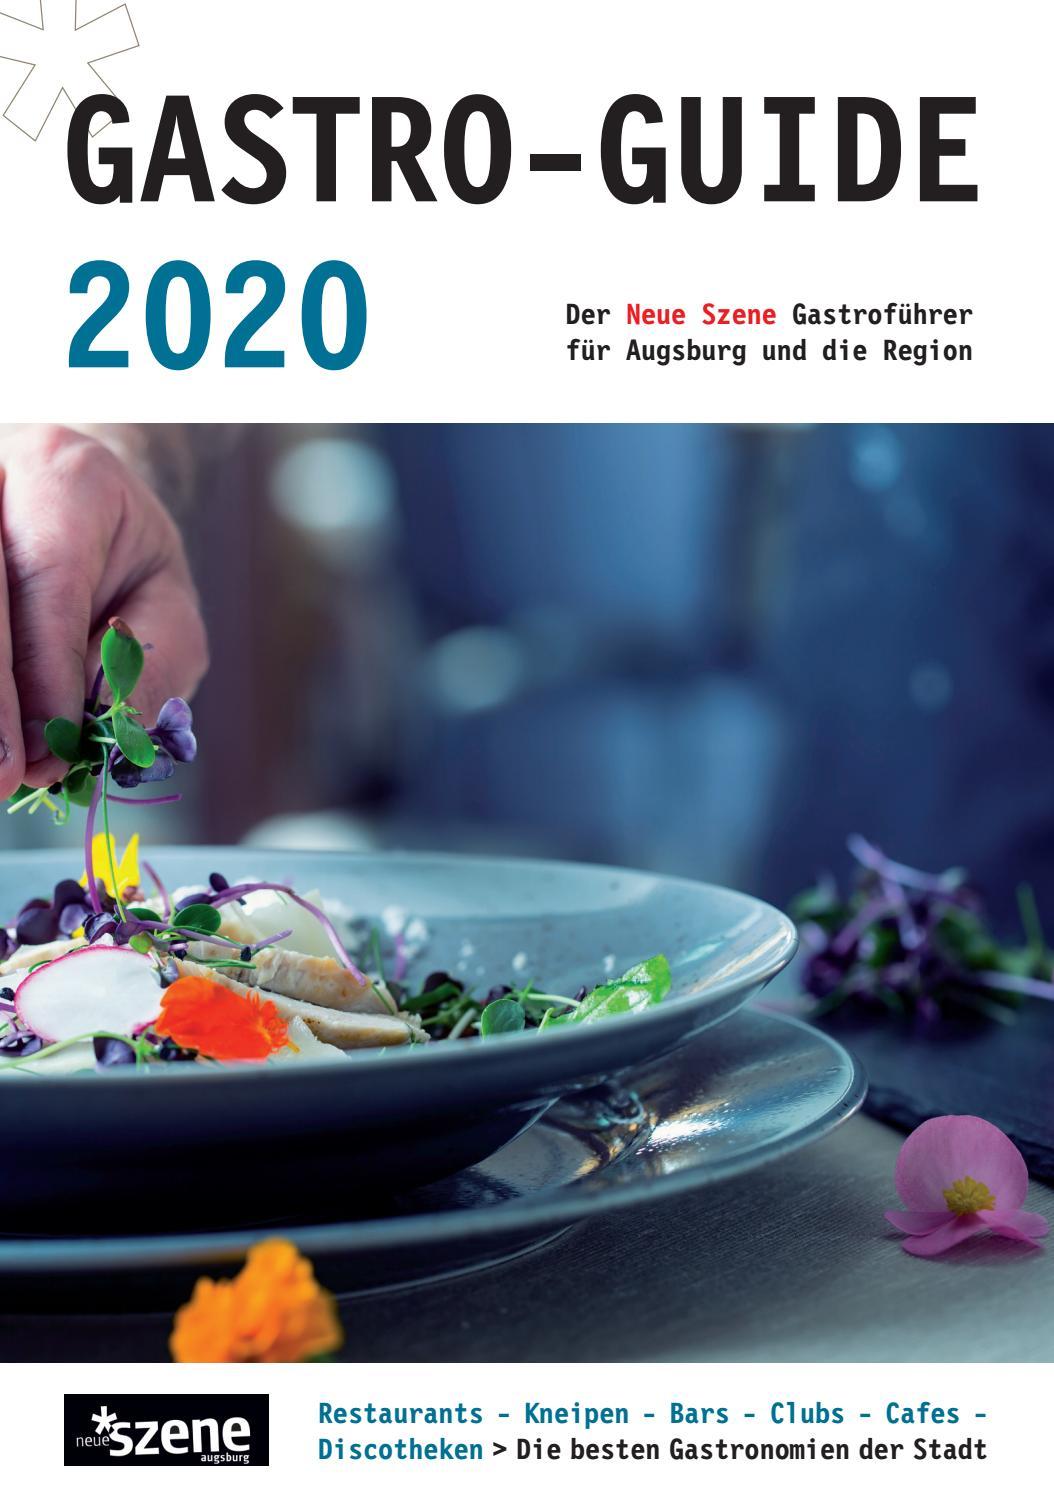 Gastro Guide Augsburg 2020 By Neue Szene Augsburg Issuu